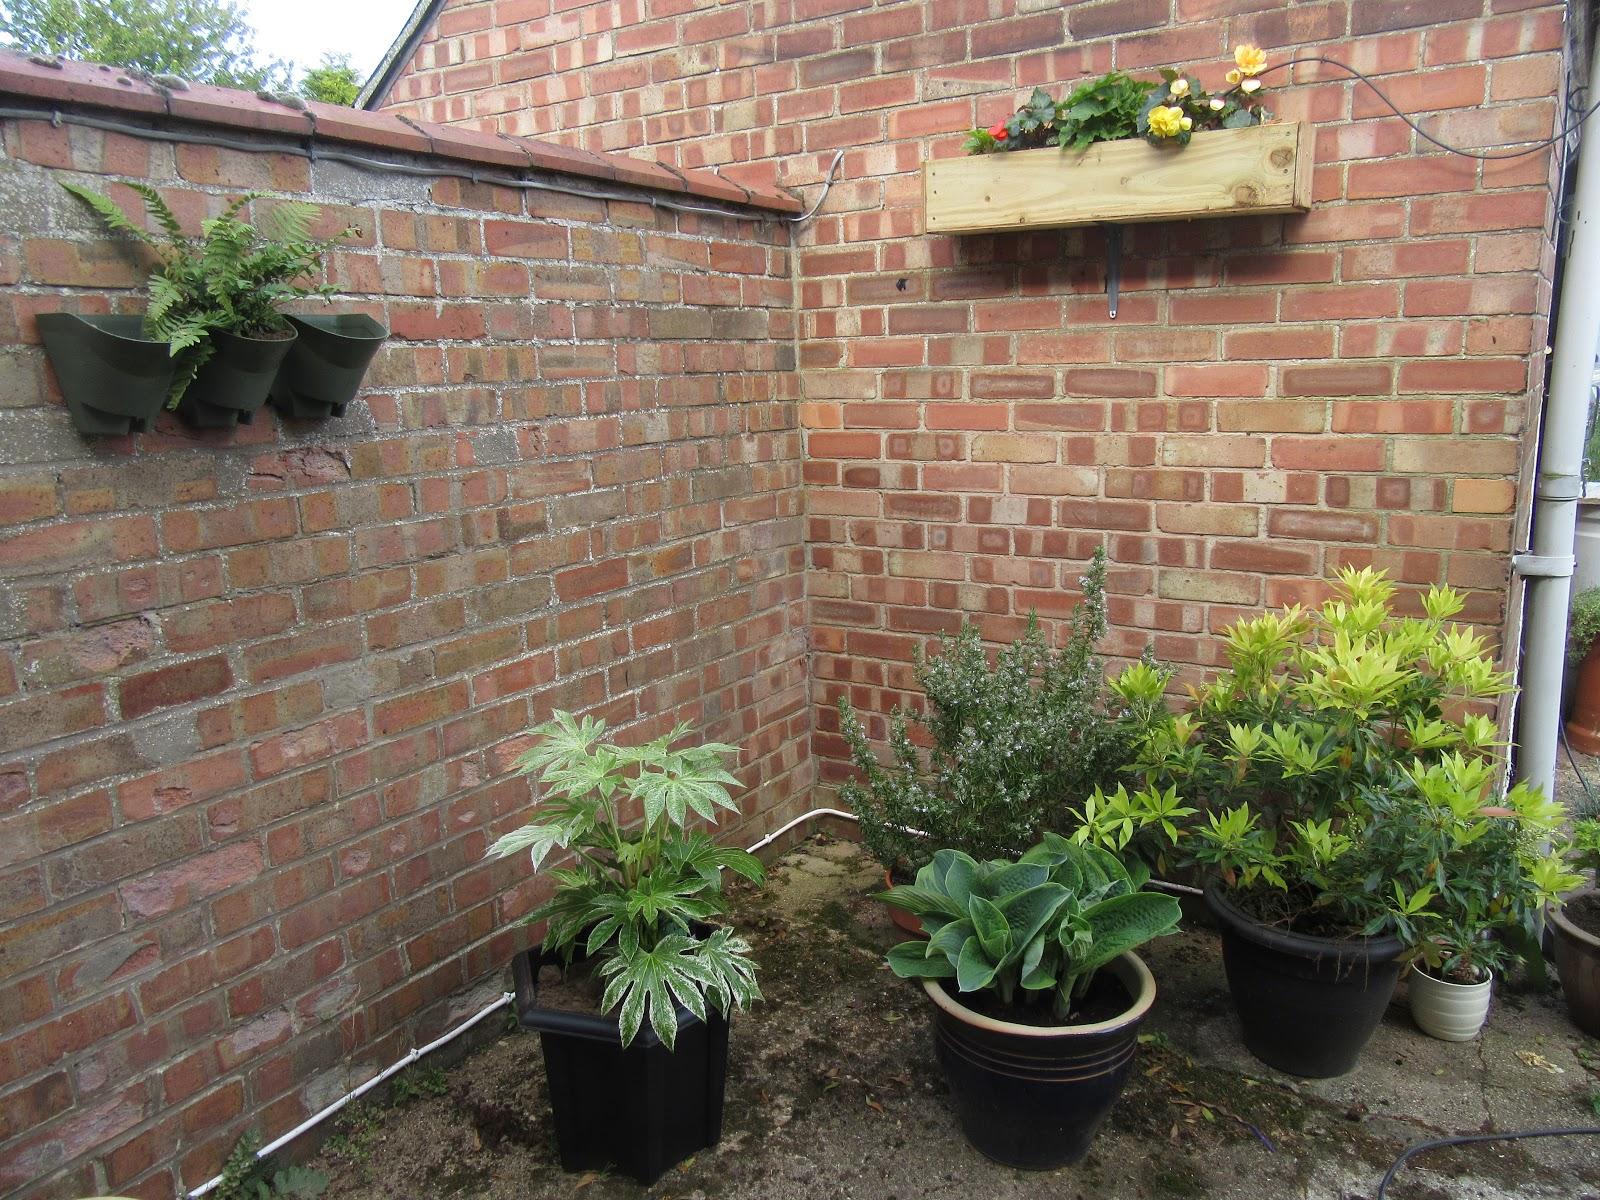 Trish Wish Living Well in Retirement: Courtyard gardening